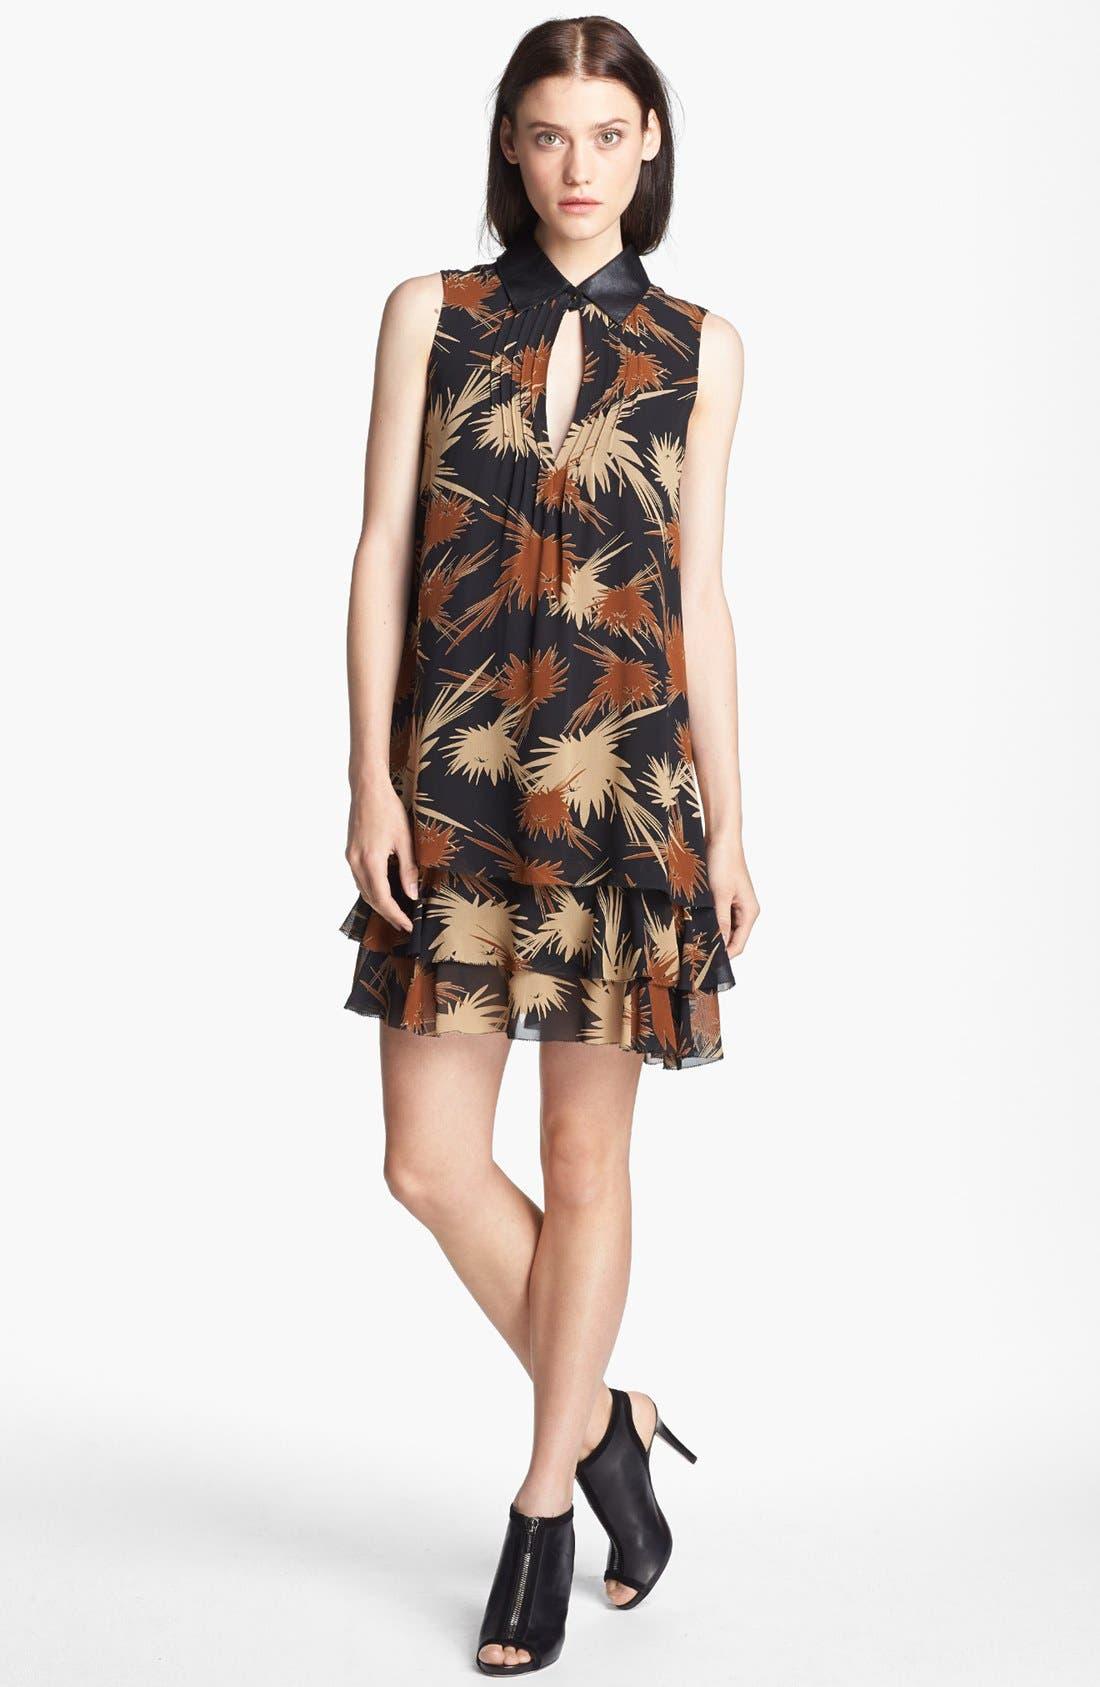 Alternate Image 1 Selected - Rachel Zoe 'Waverly' Print Crepe Trapeze Dress